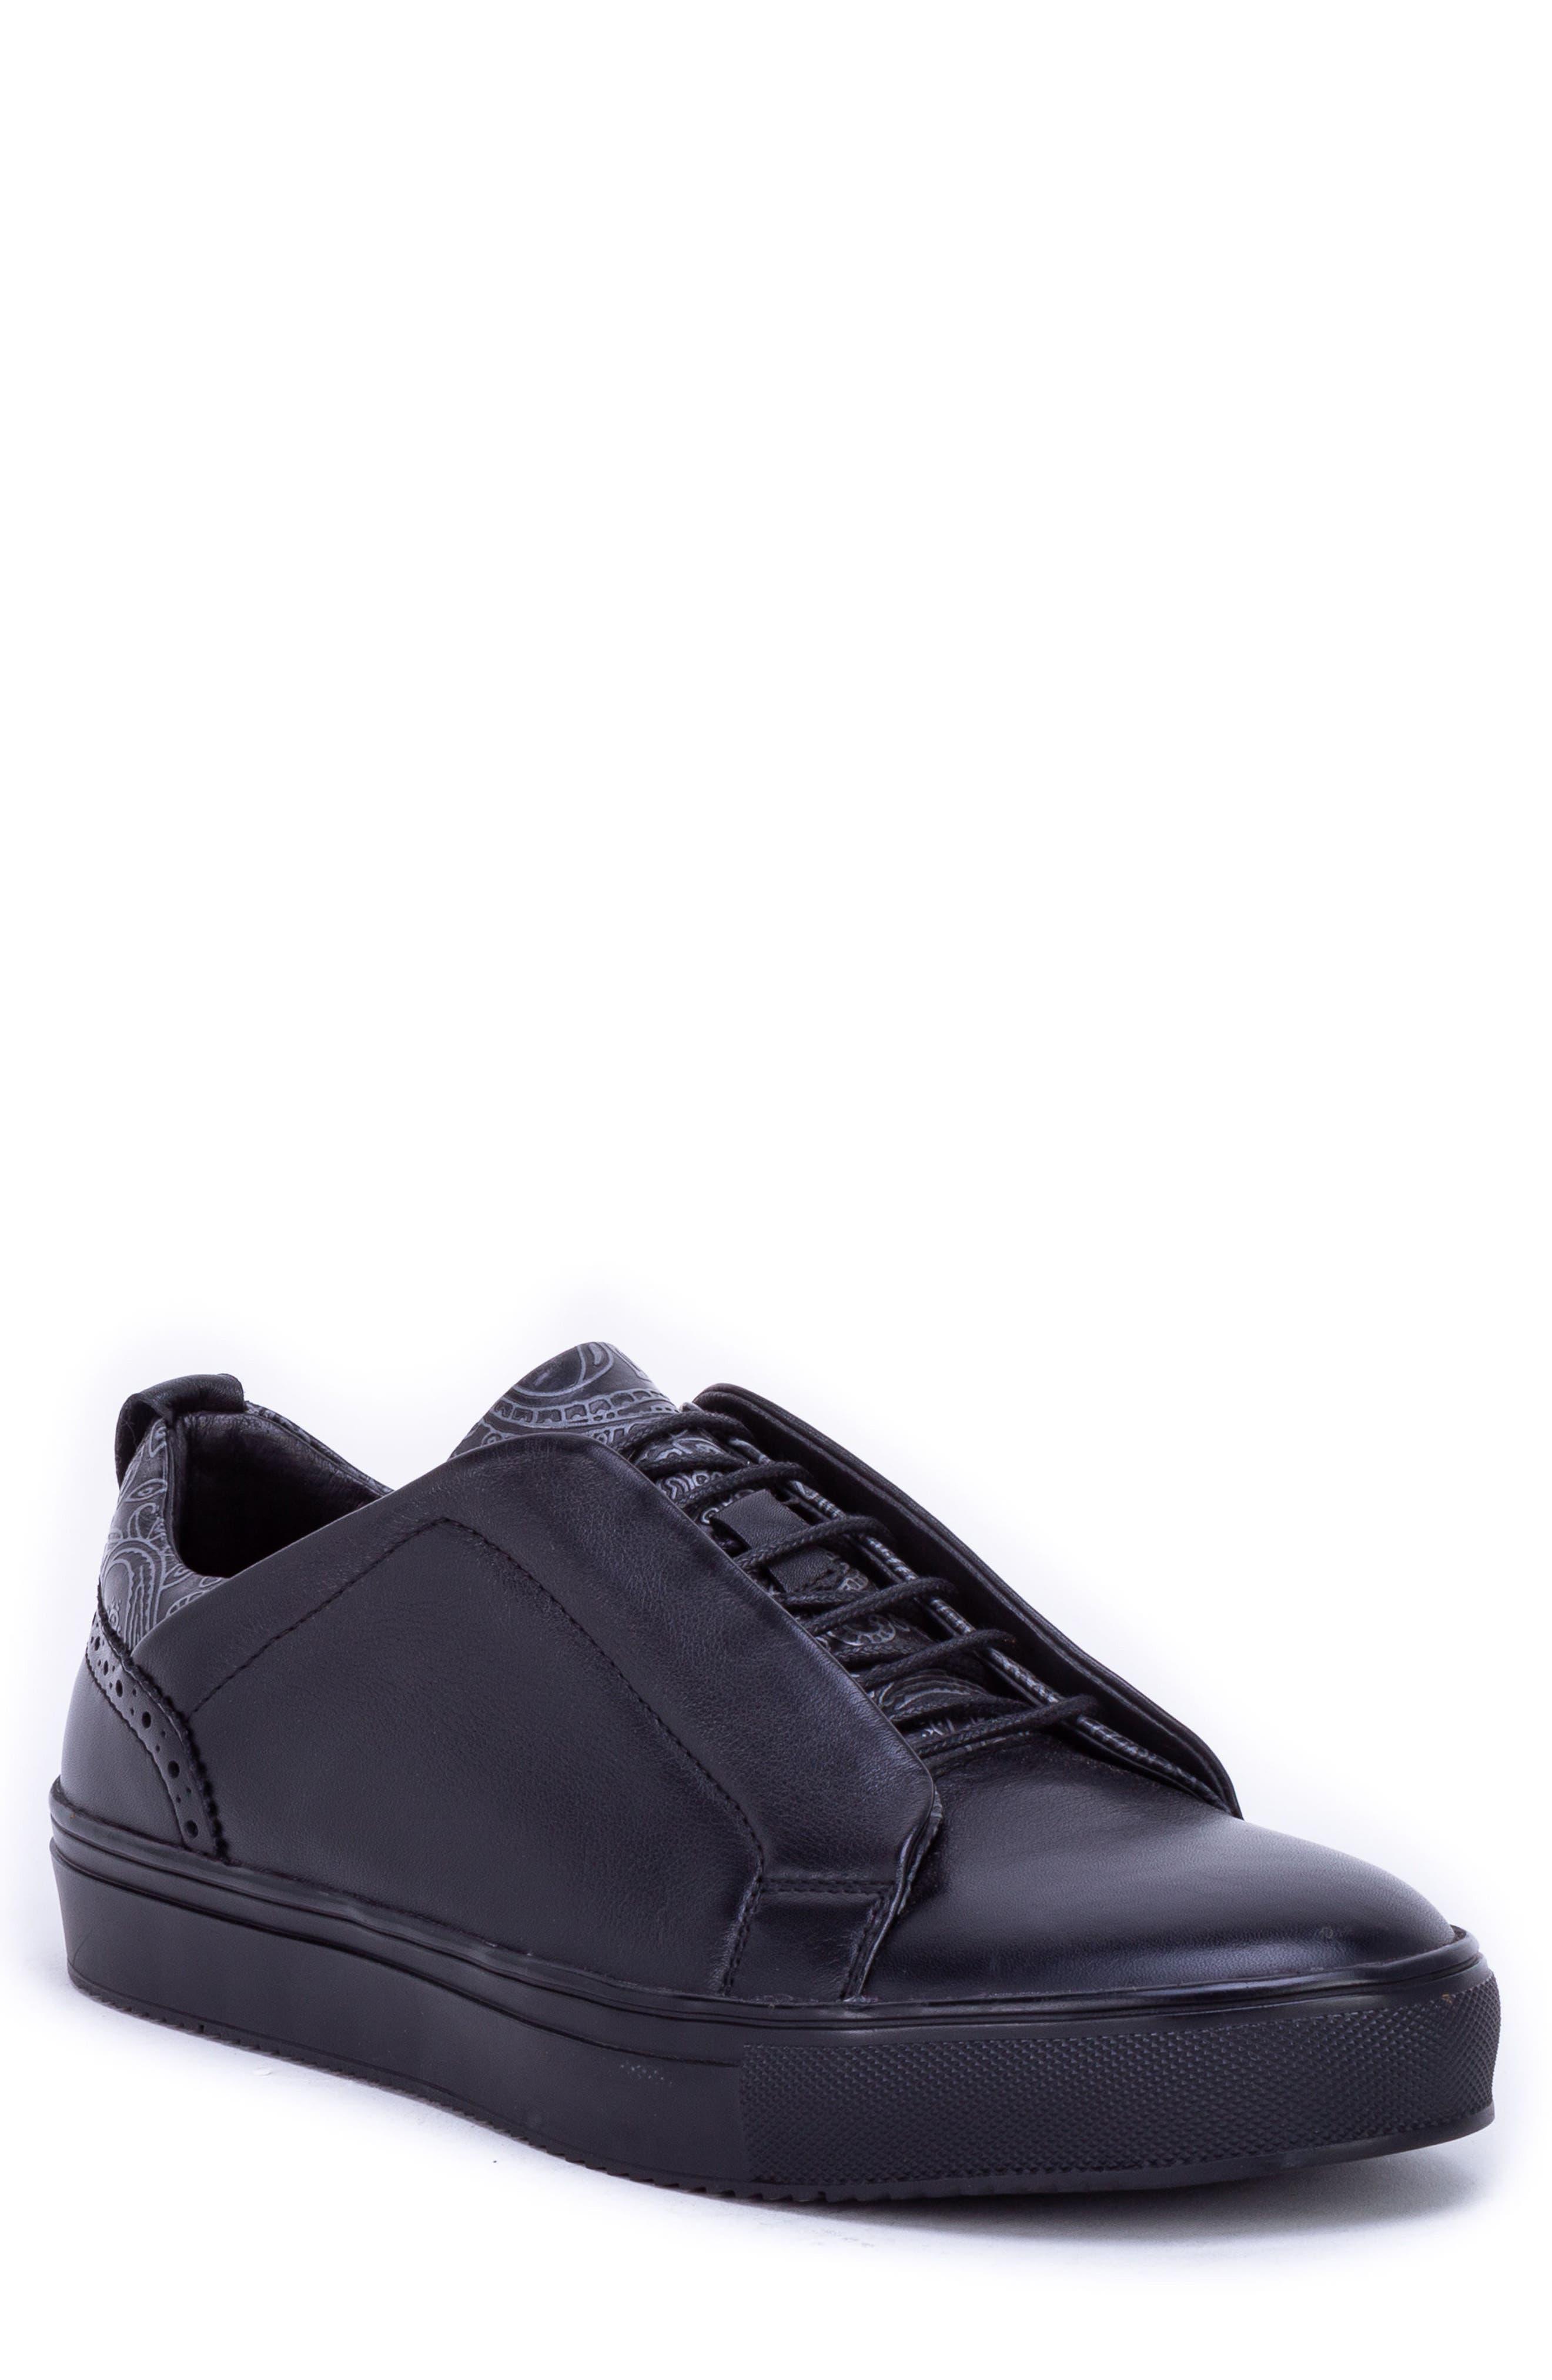 Sharpe Textured Sneaker,                             Main thumbnail 1, color,                             001